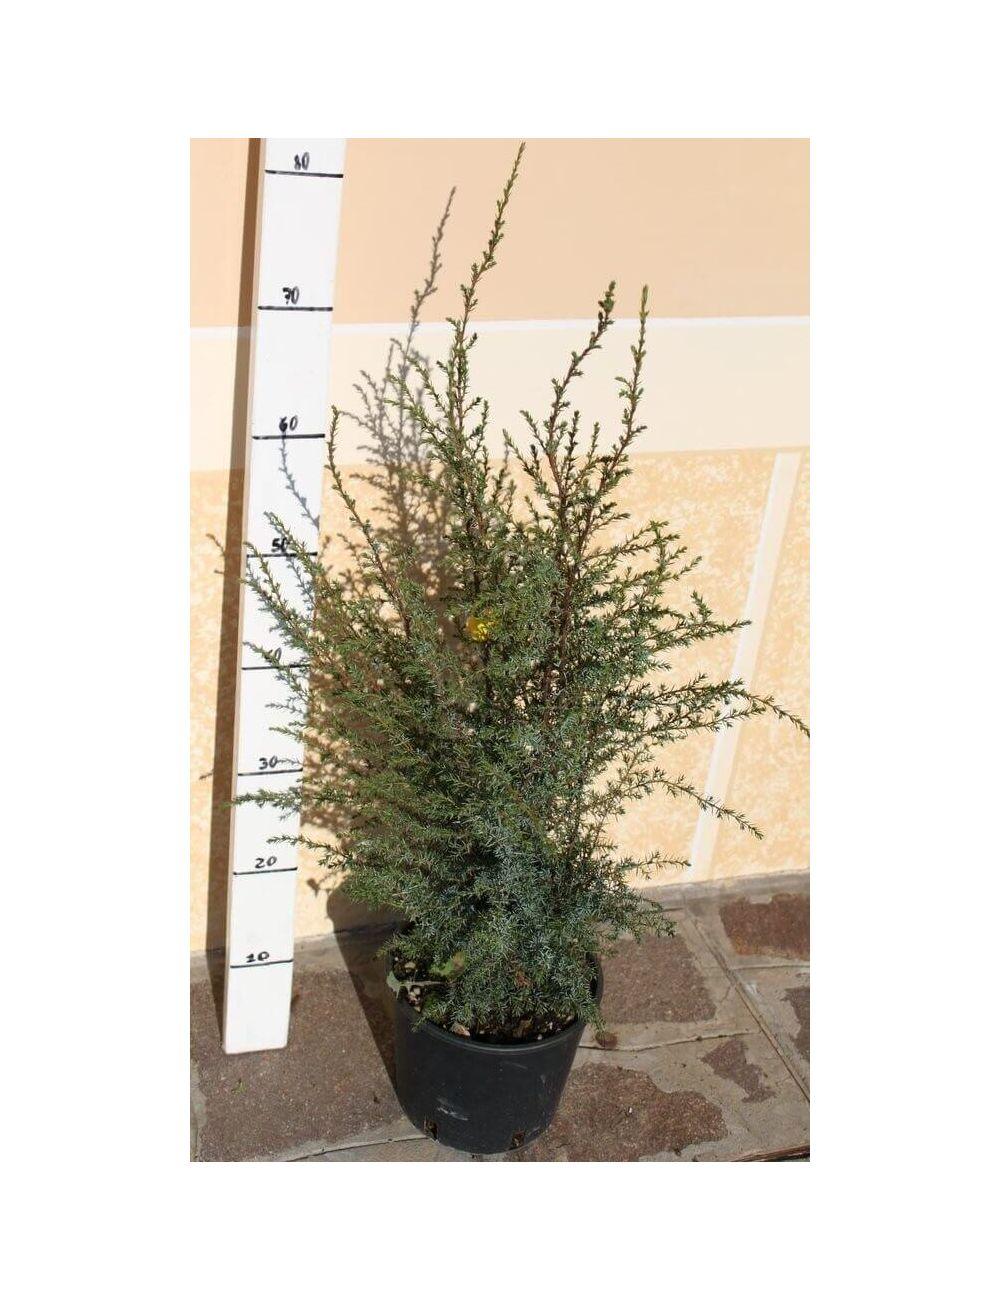 Ginepro communis hibernica vendita piante on line for Vendita piante mirtillo on line